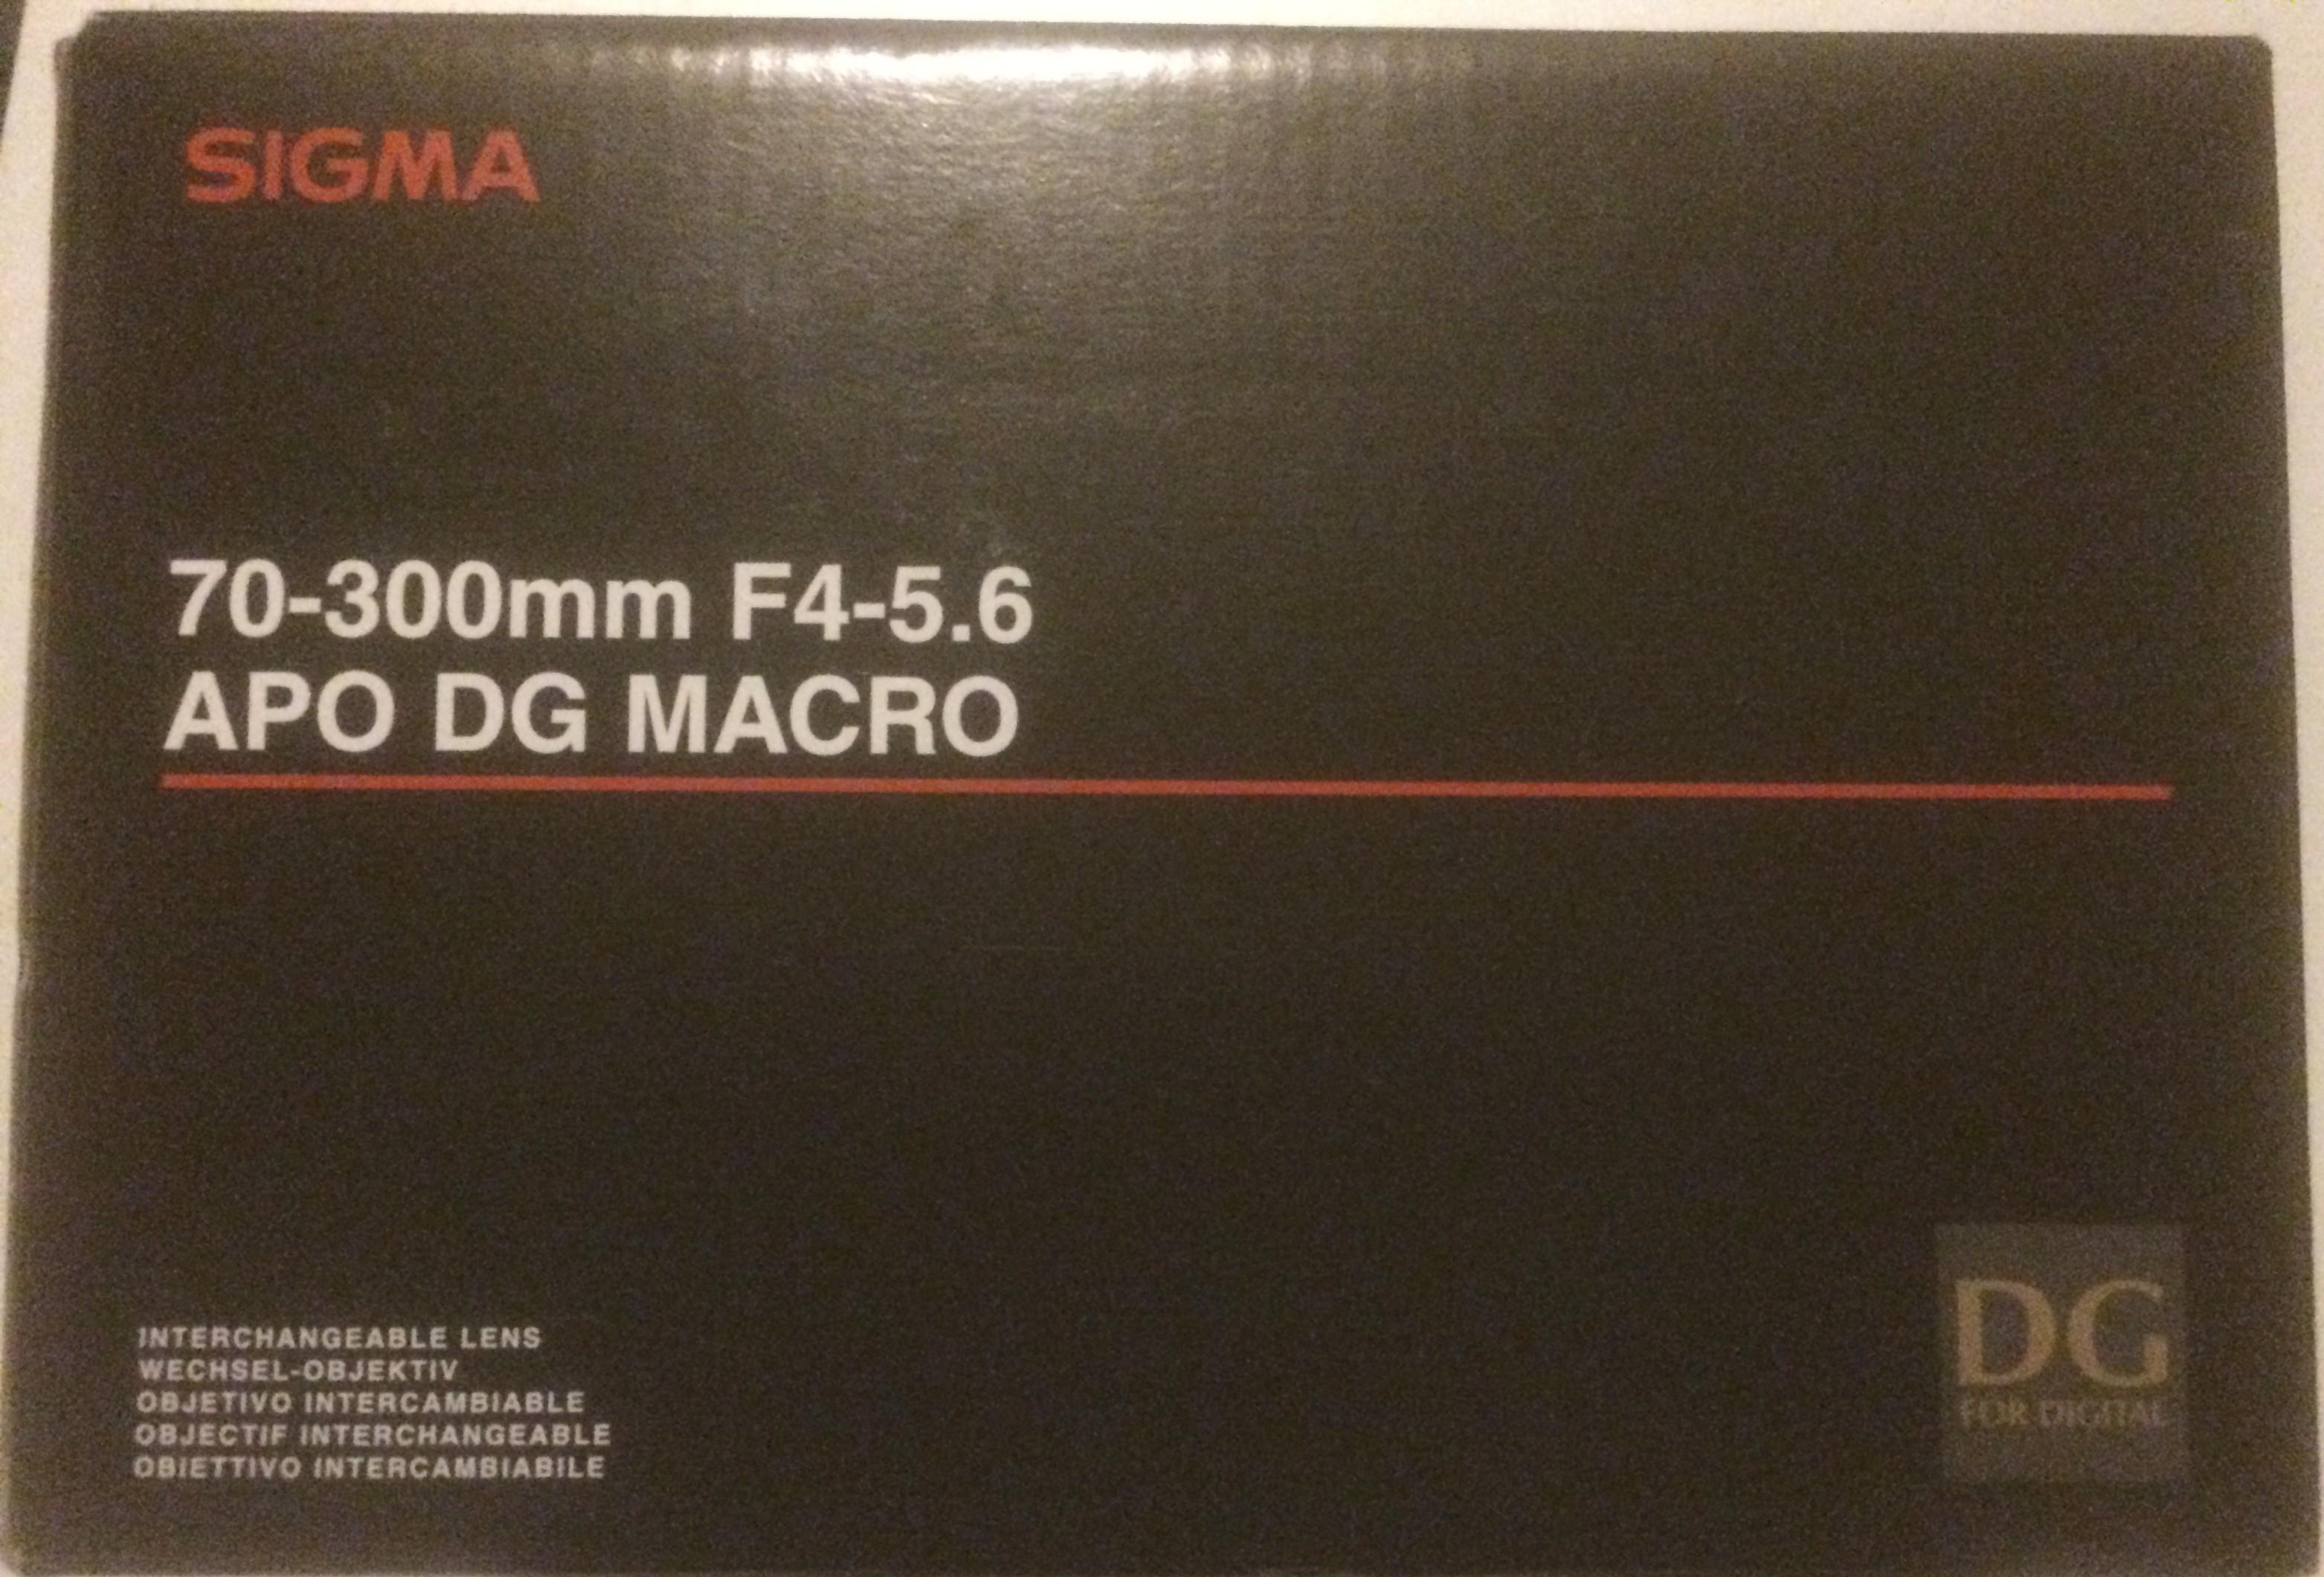 Sigma 70-300mm F4-5.6 DG APO Macro